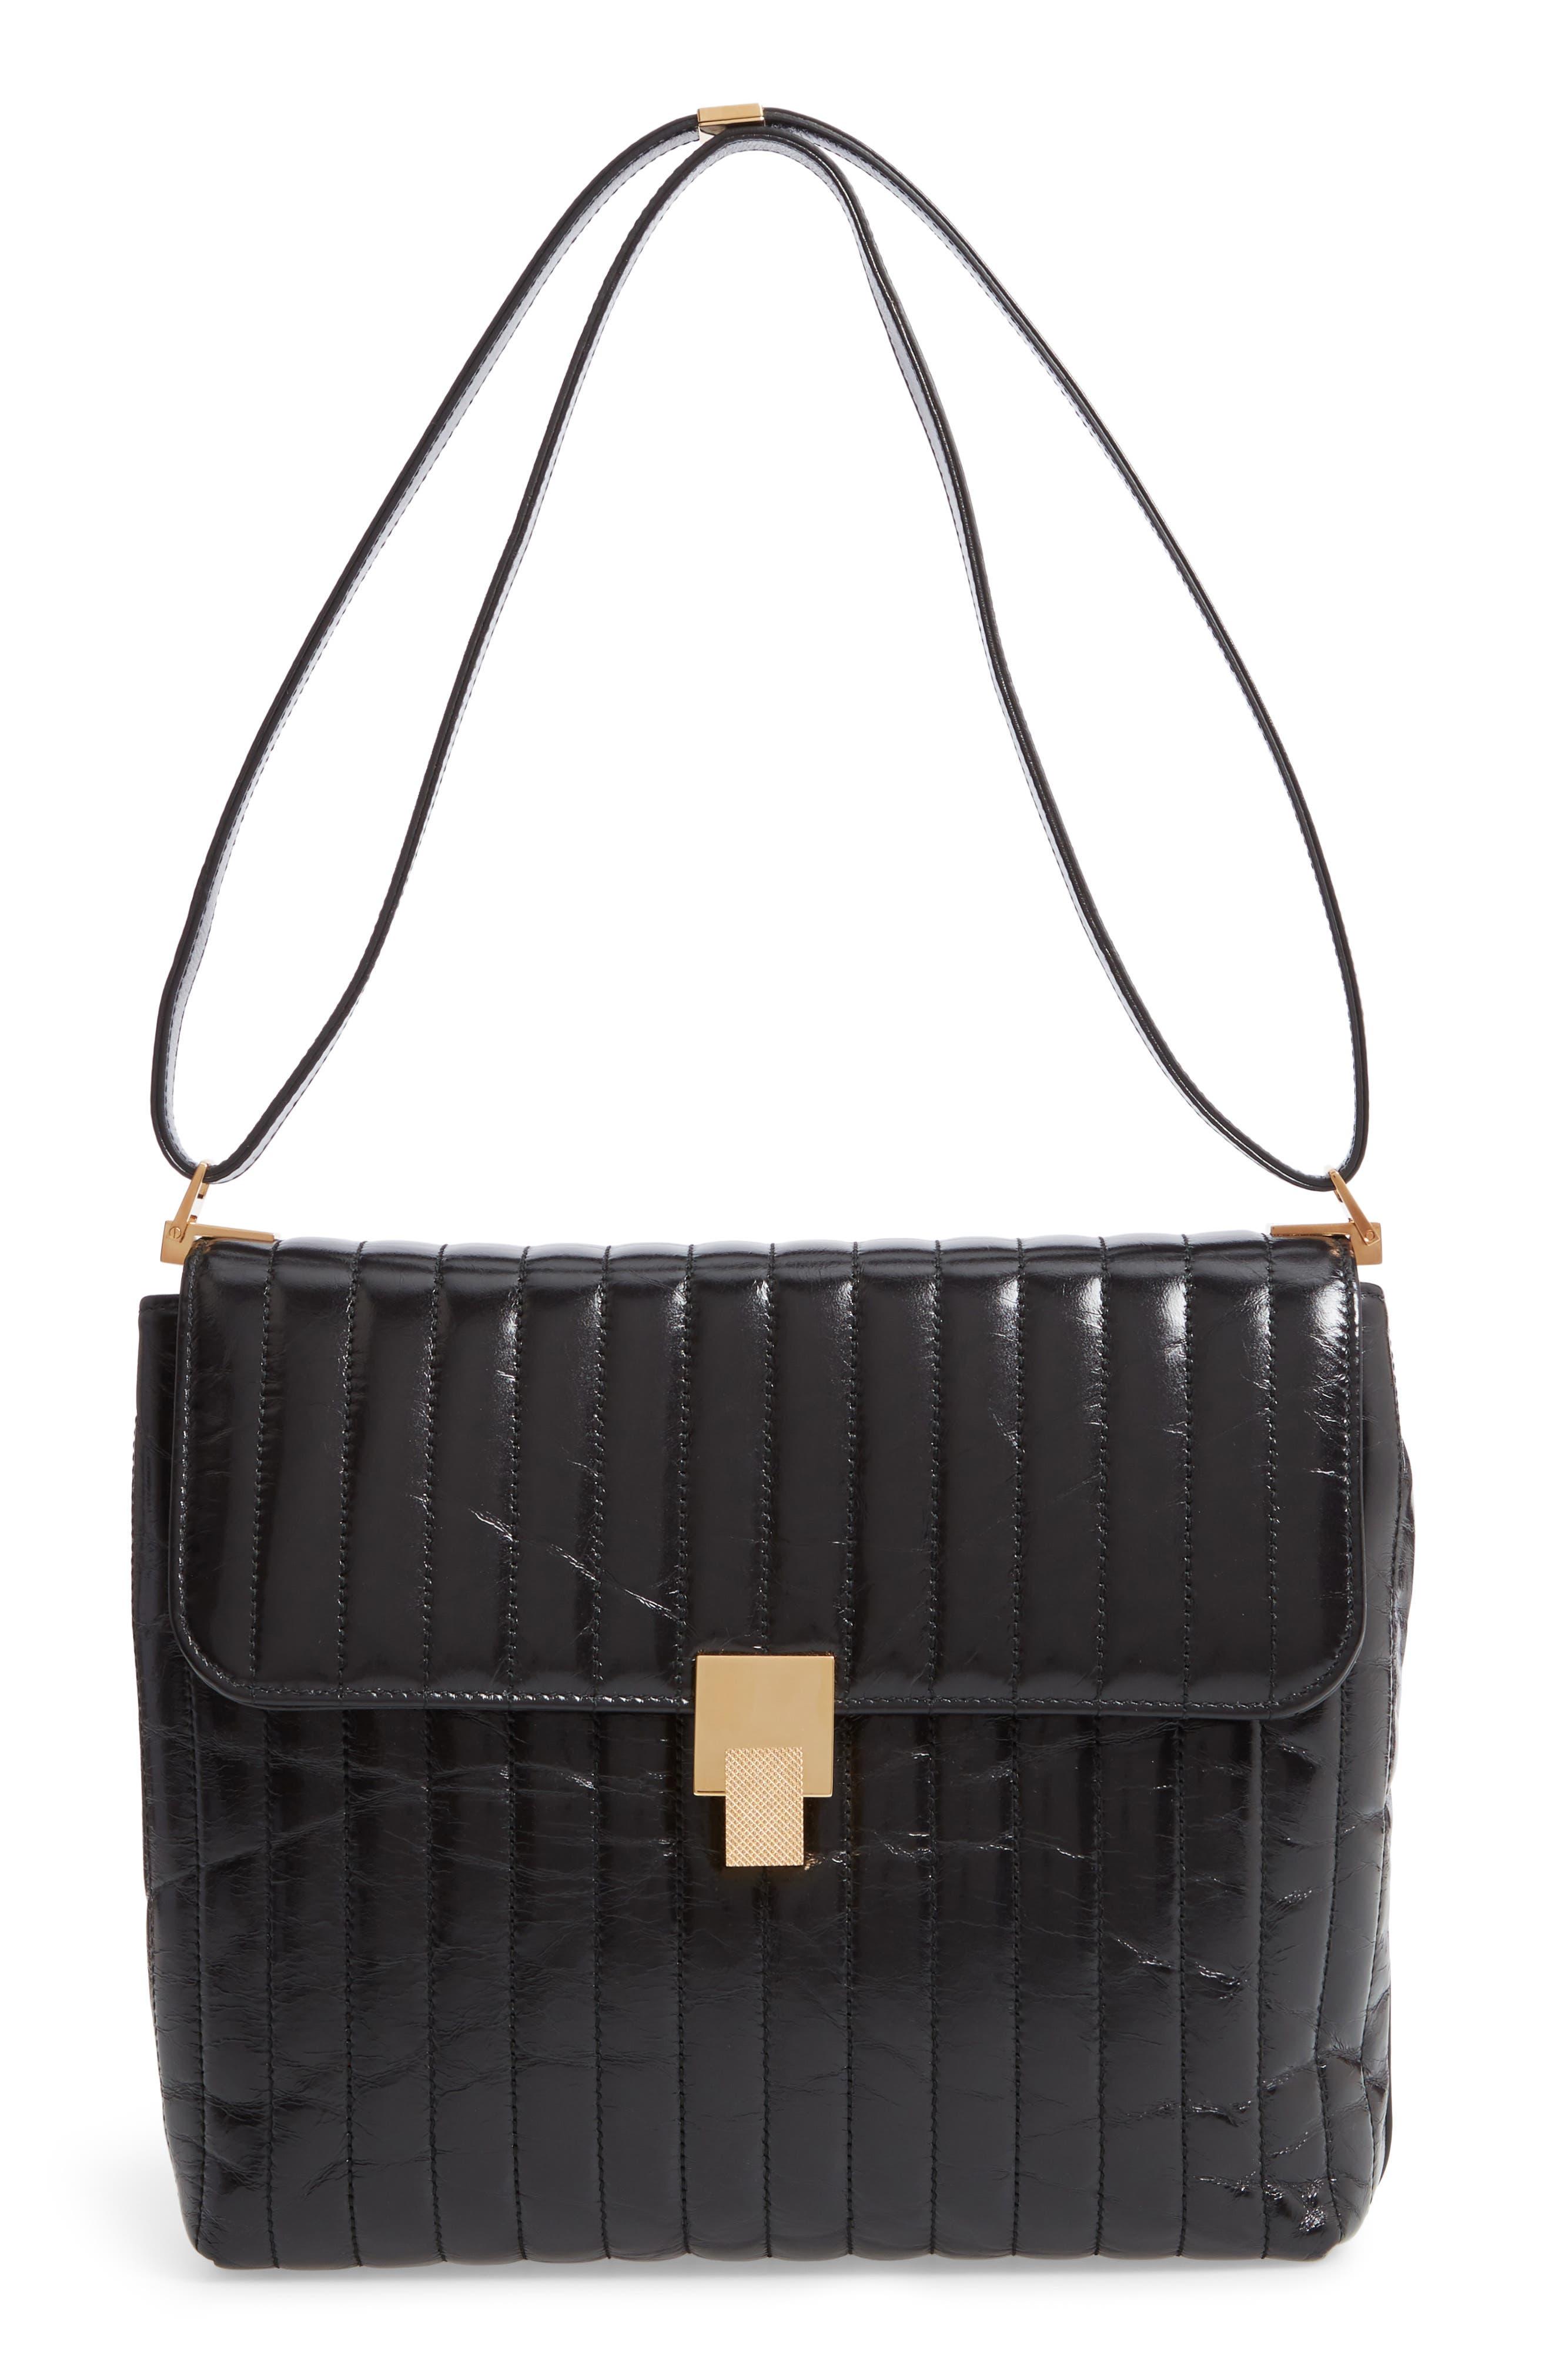 VICTORIA BECKHAM, Quinton Quilted Leather Shoulder Bag, Main thumbnail 1, color, 001